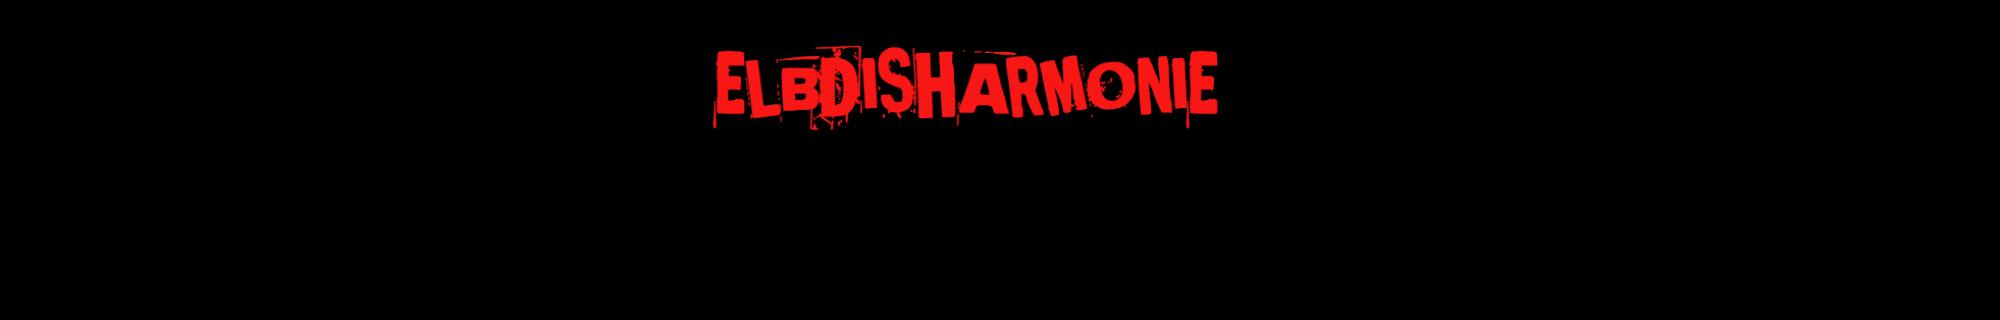 ELBDISHARMONIE